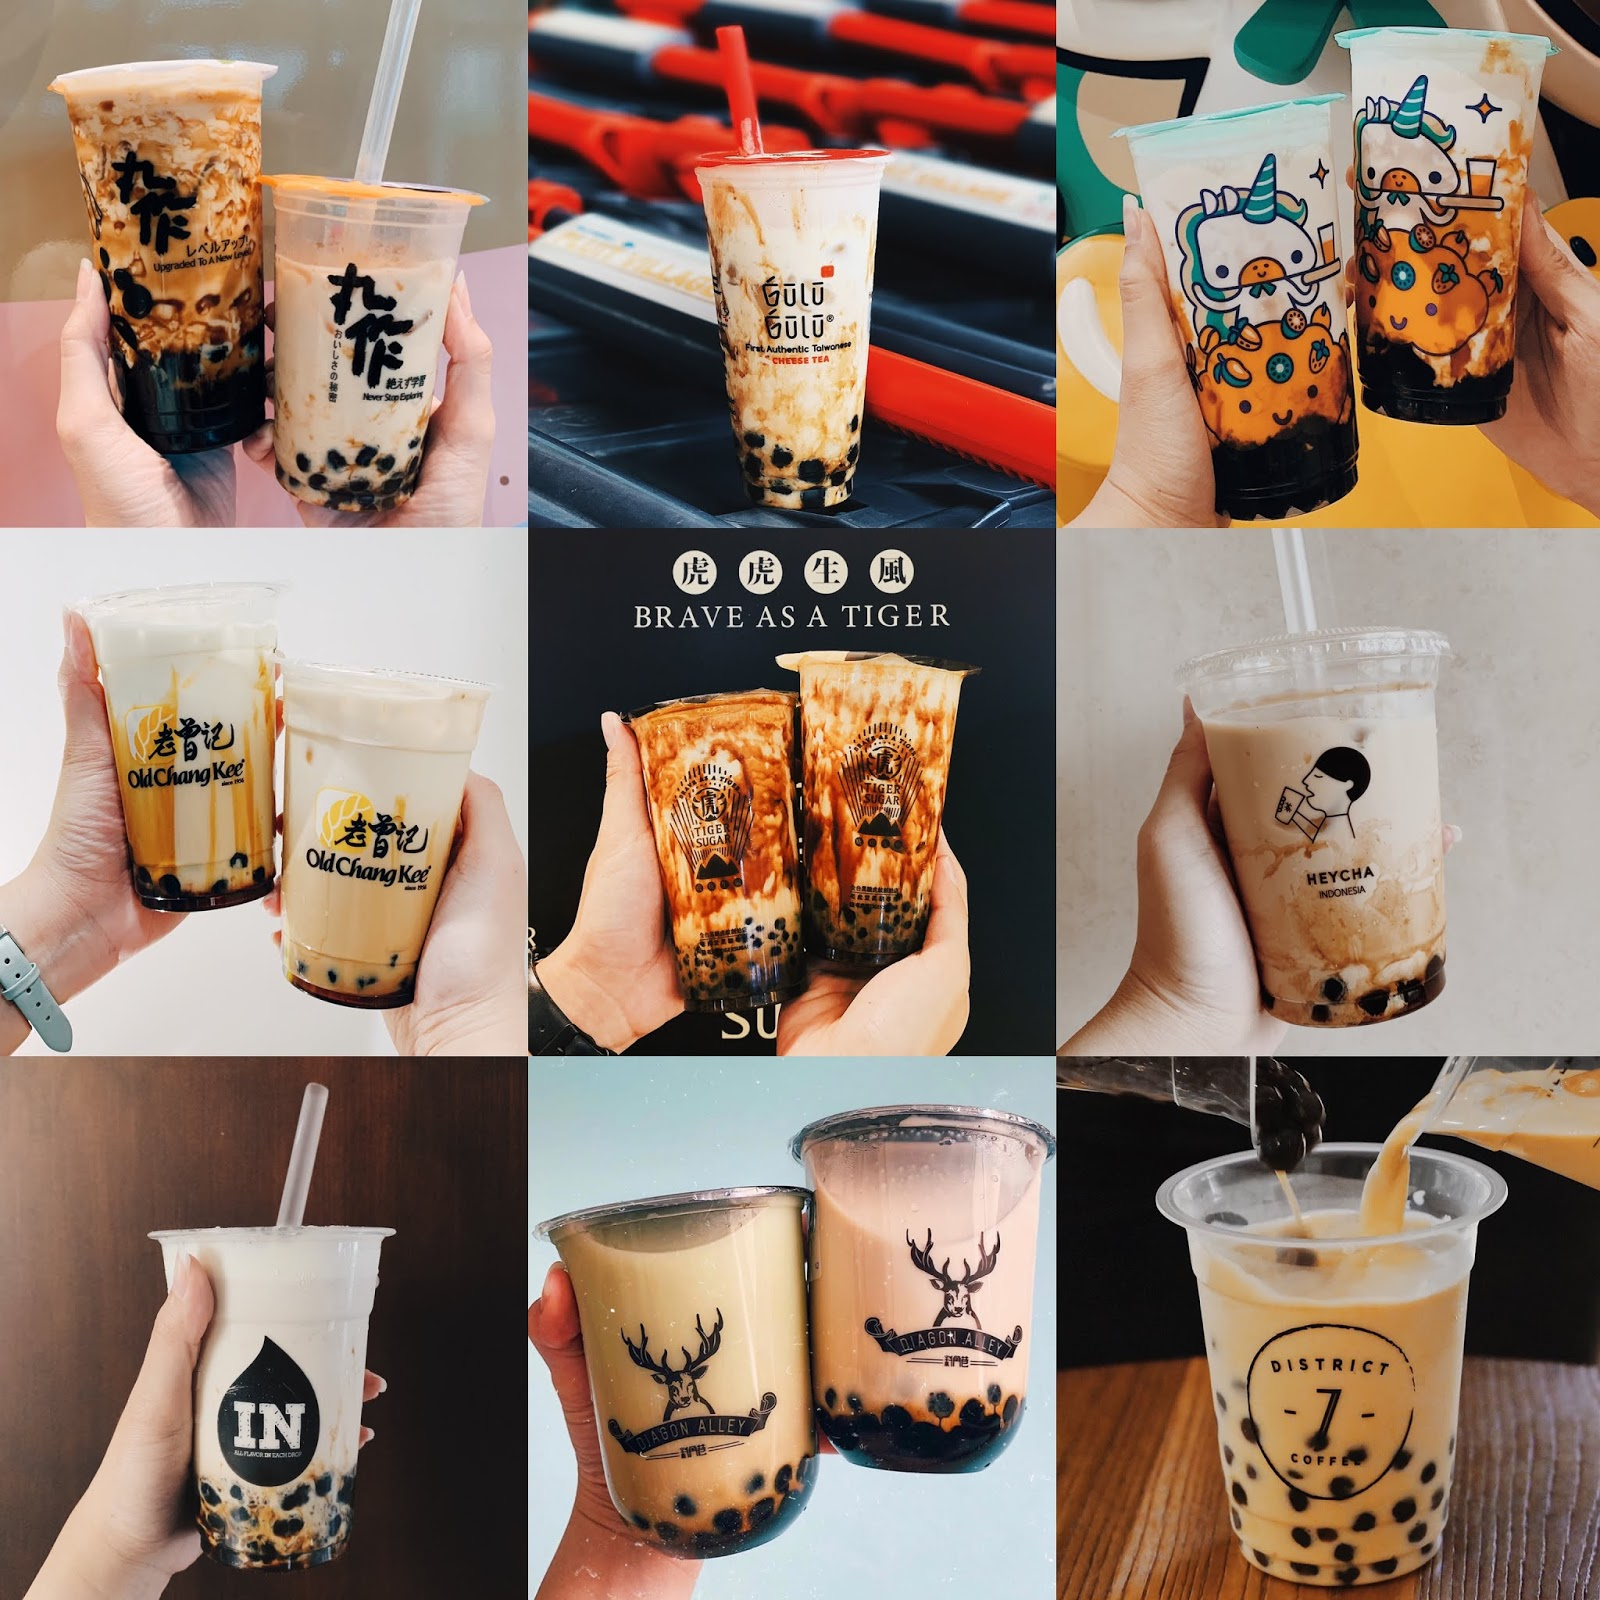 LULABYSPOON - Indonesian Food Blogger & Photographer: BROWN